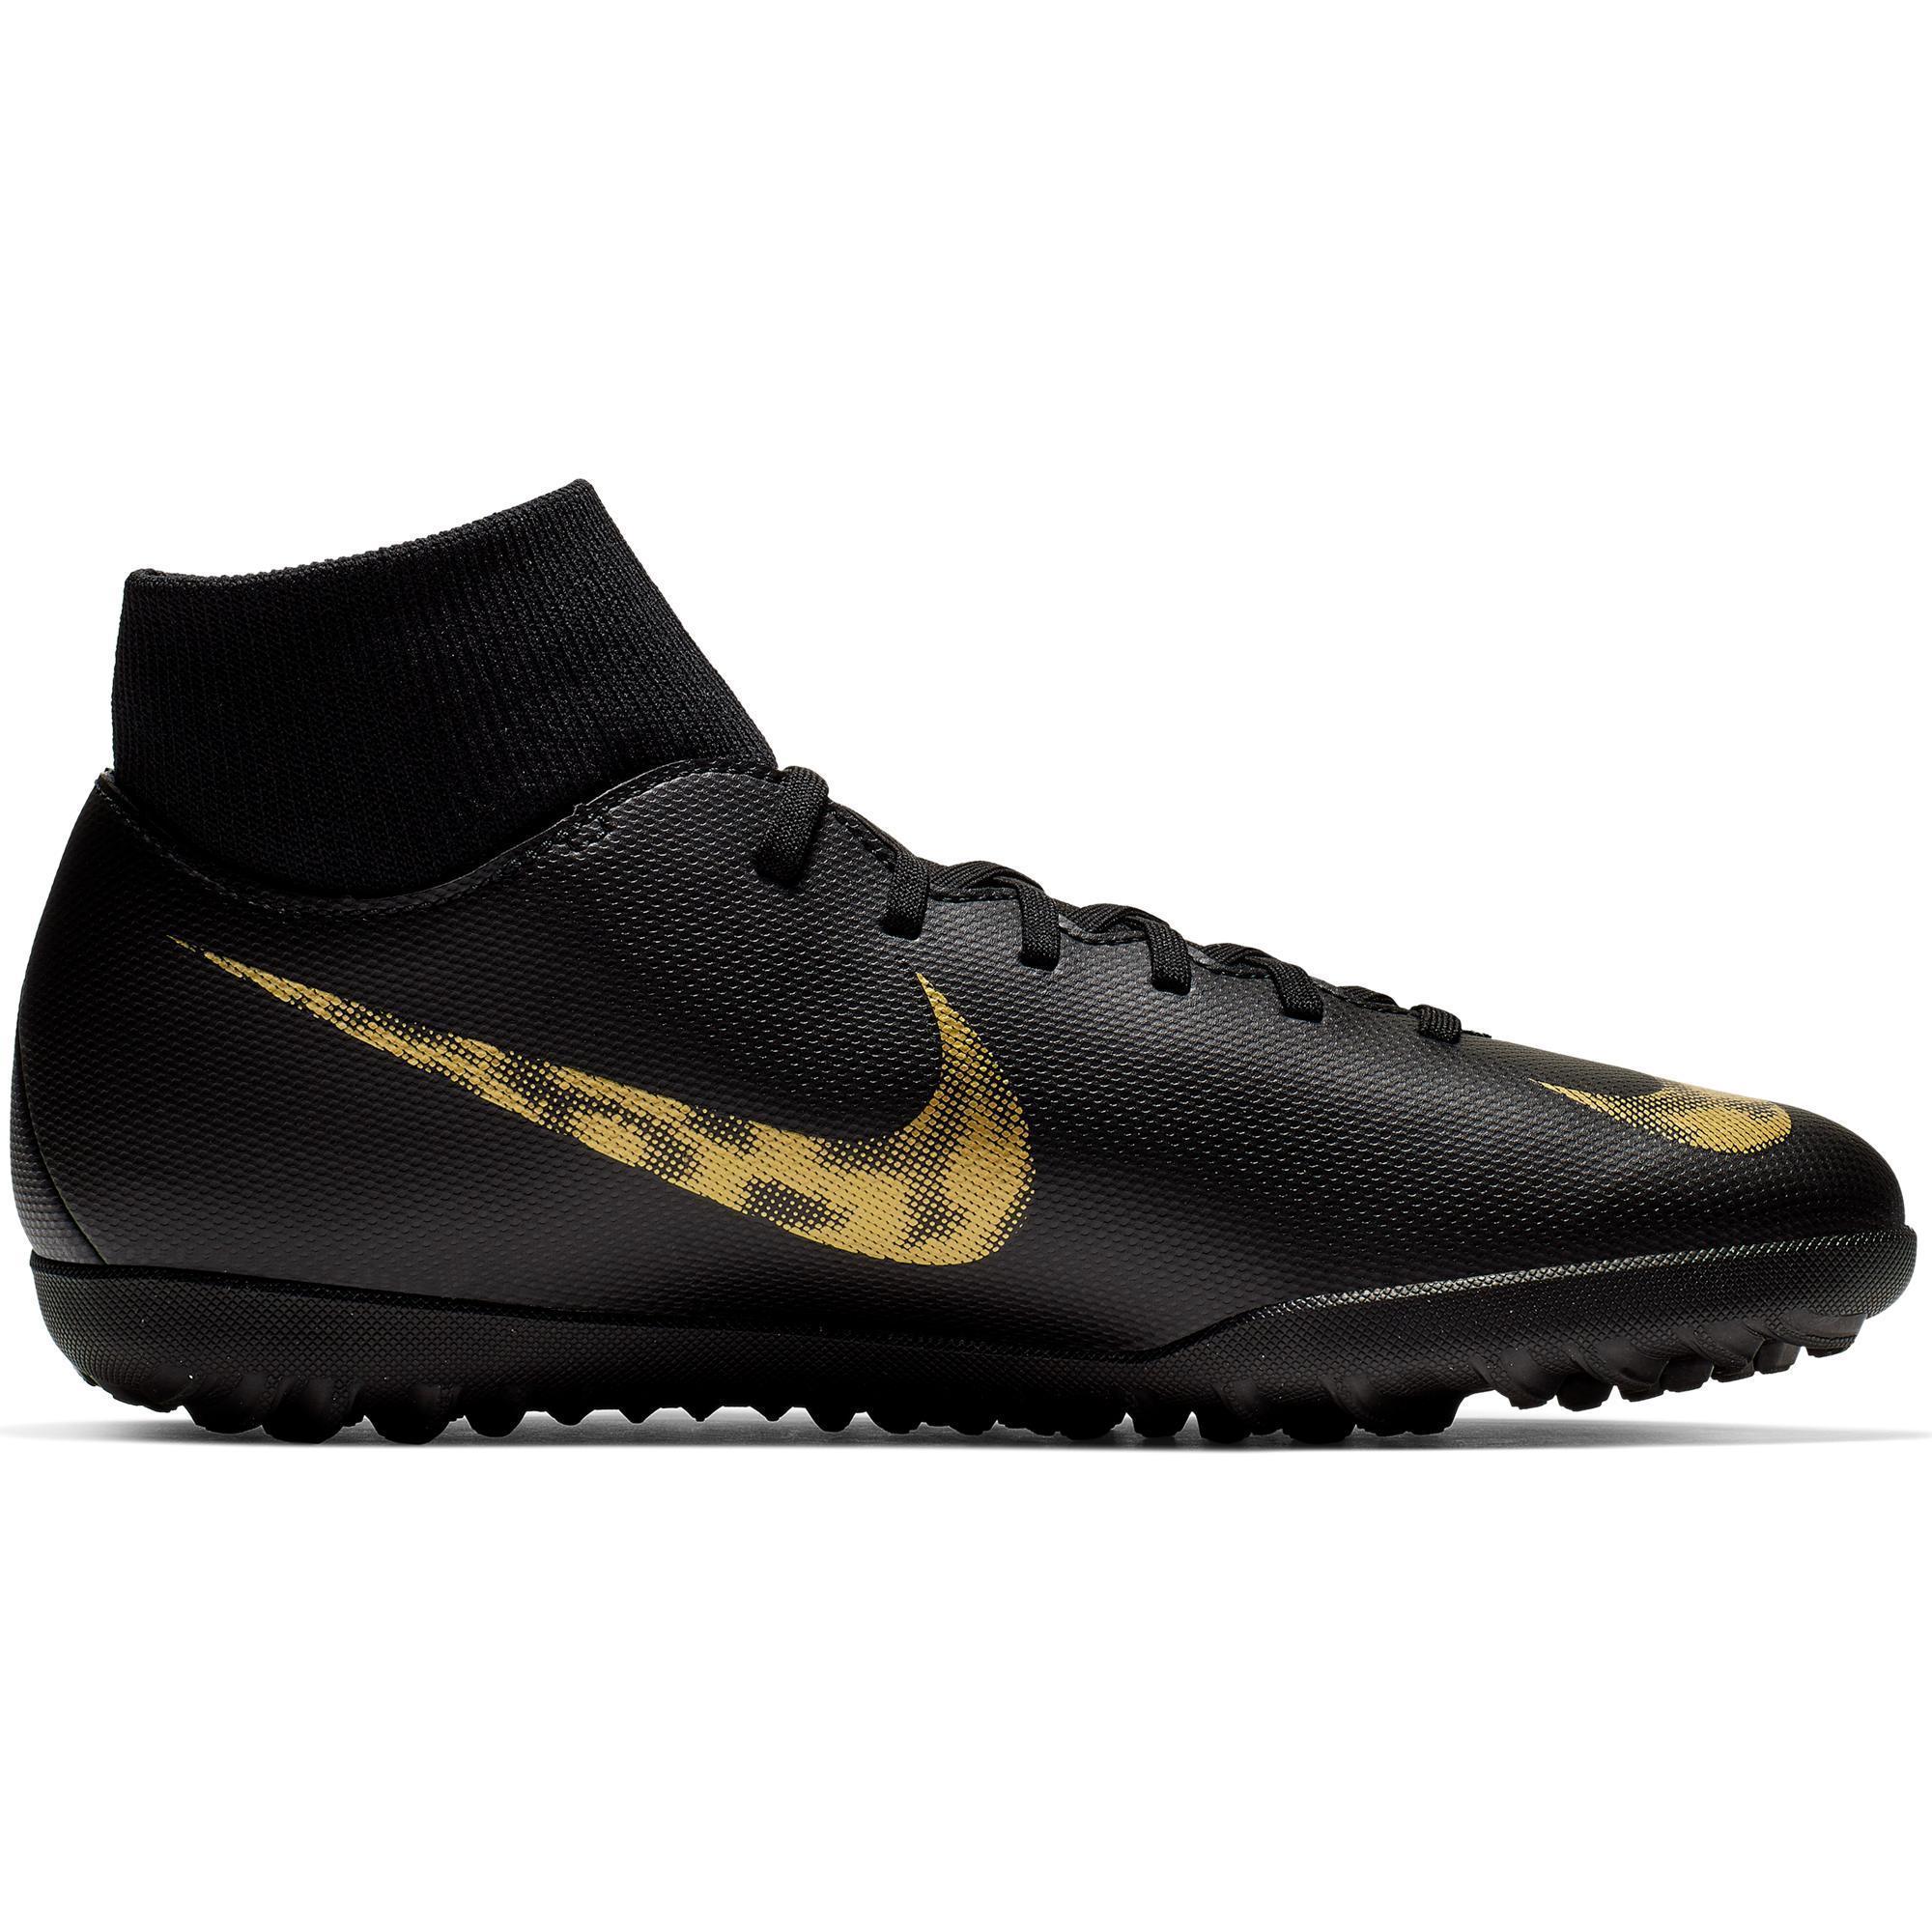 hot sale online 6adf5 1ab60 Nike Voetbalschoenen Mercurial Superfly 6 Club TF zwart 45 EUR 39.99